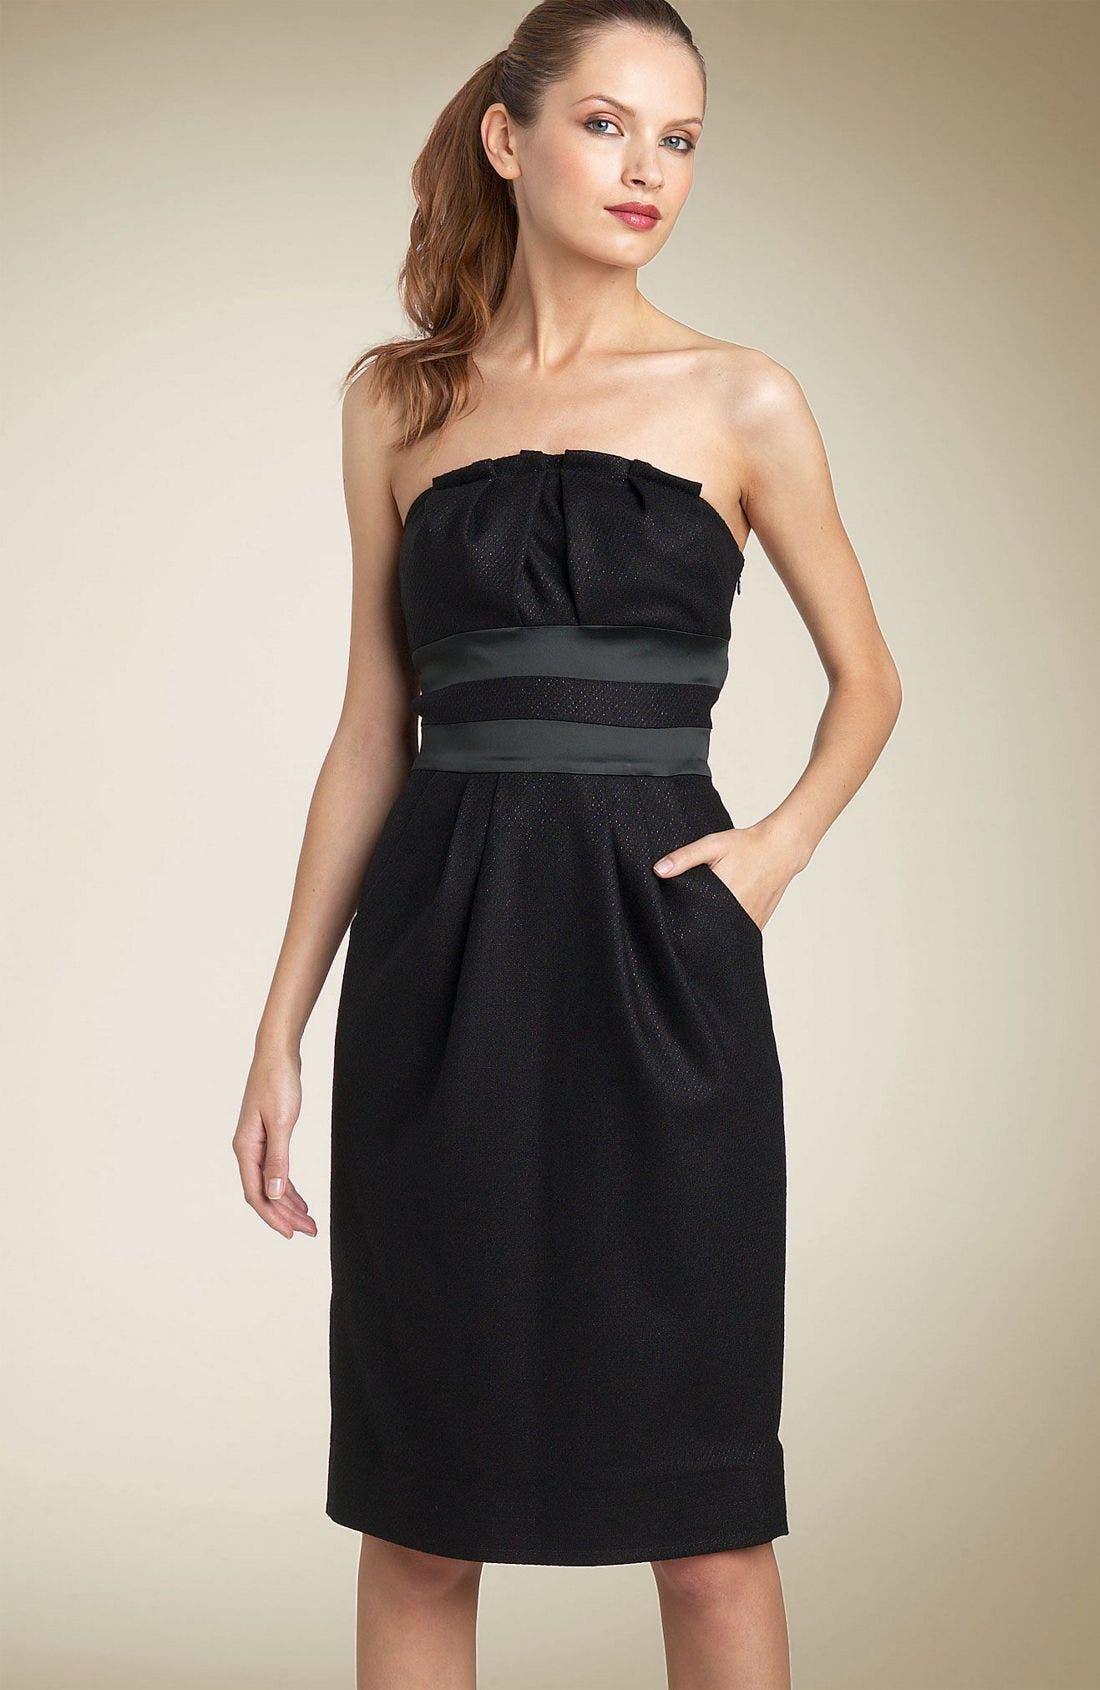 Main Image - Diane von Furstenberg 'Filomena' Dress